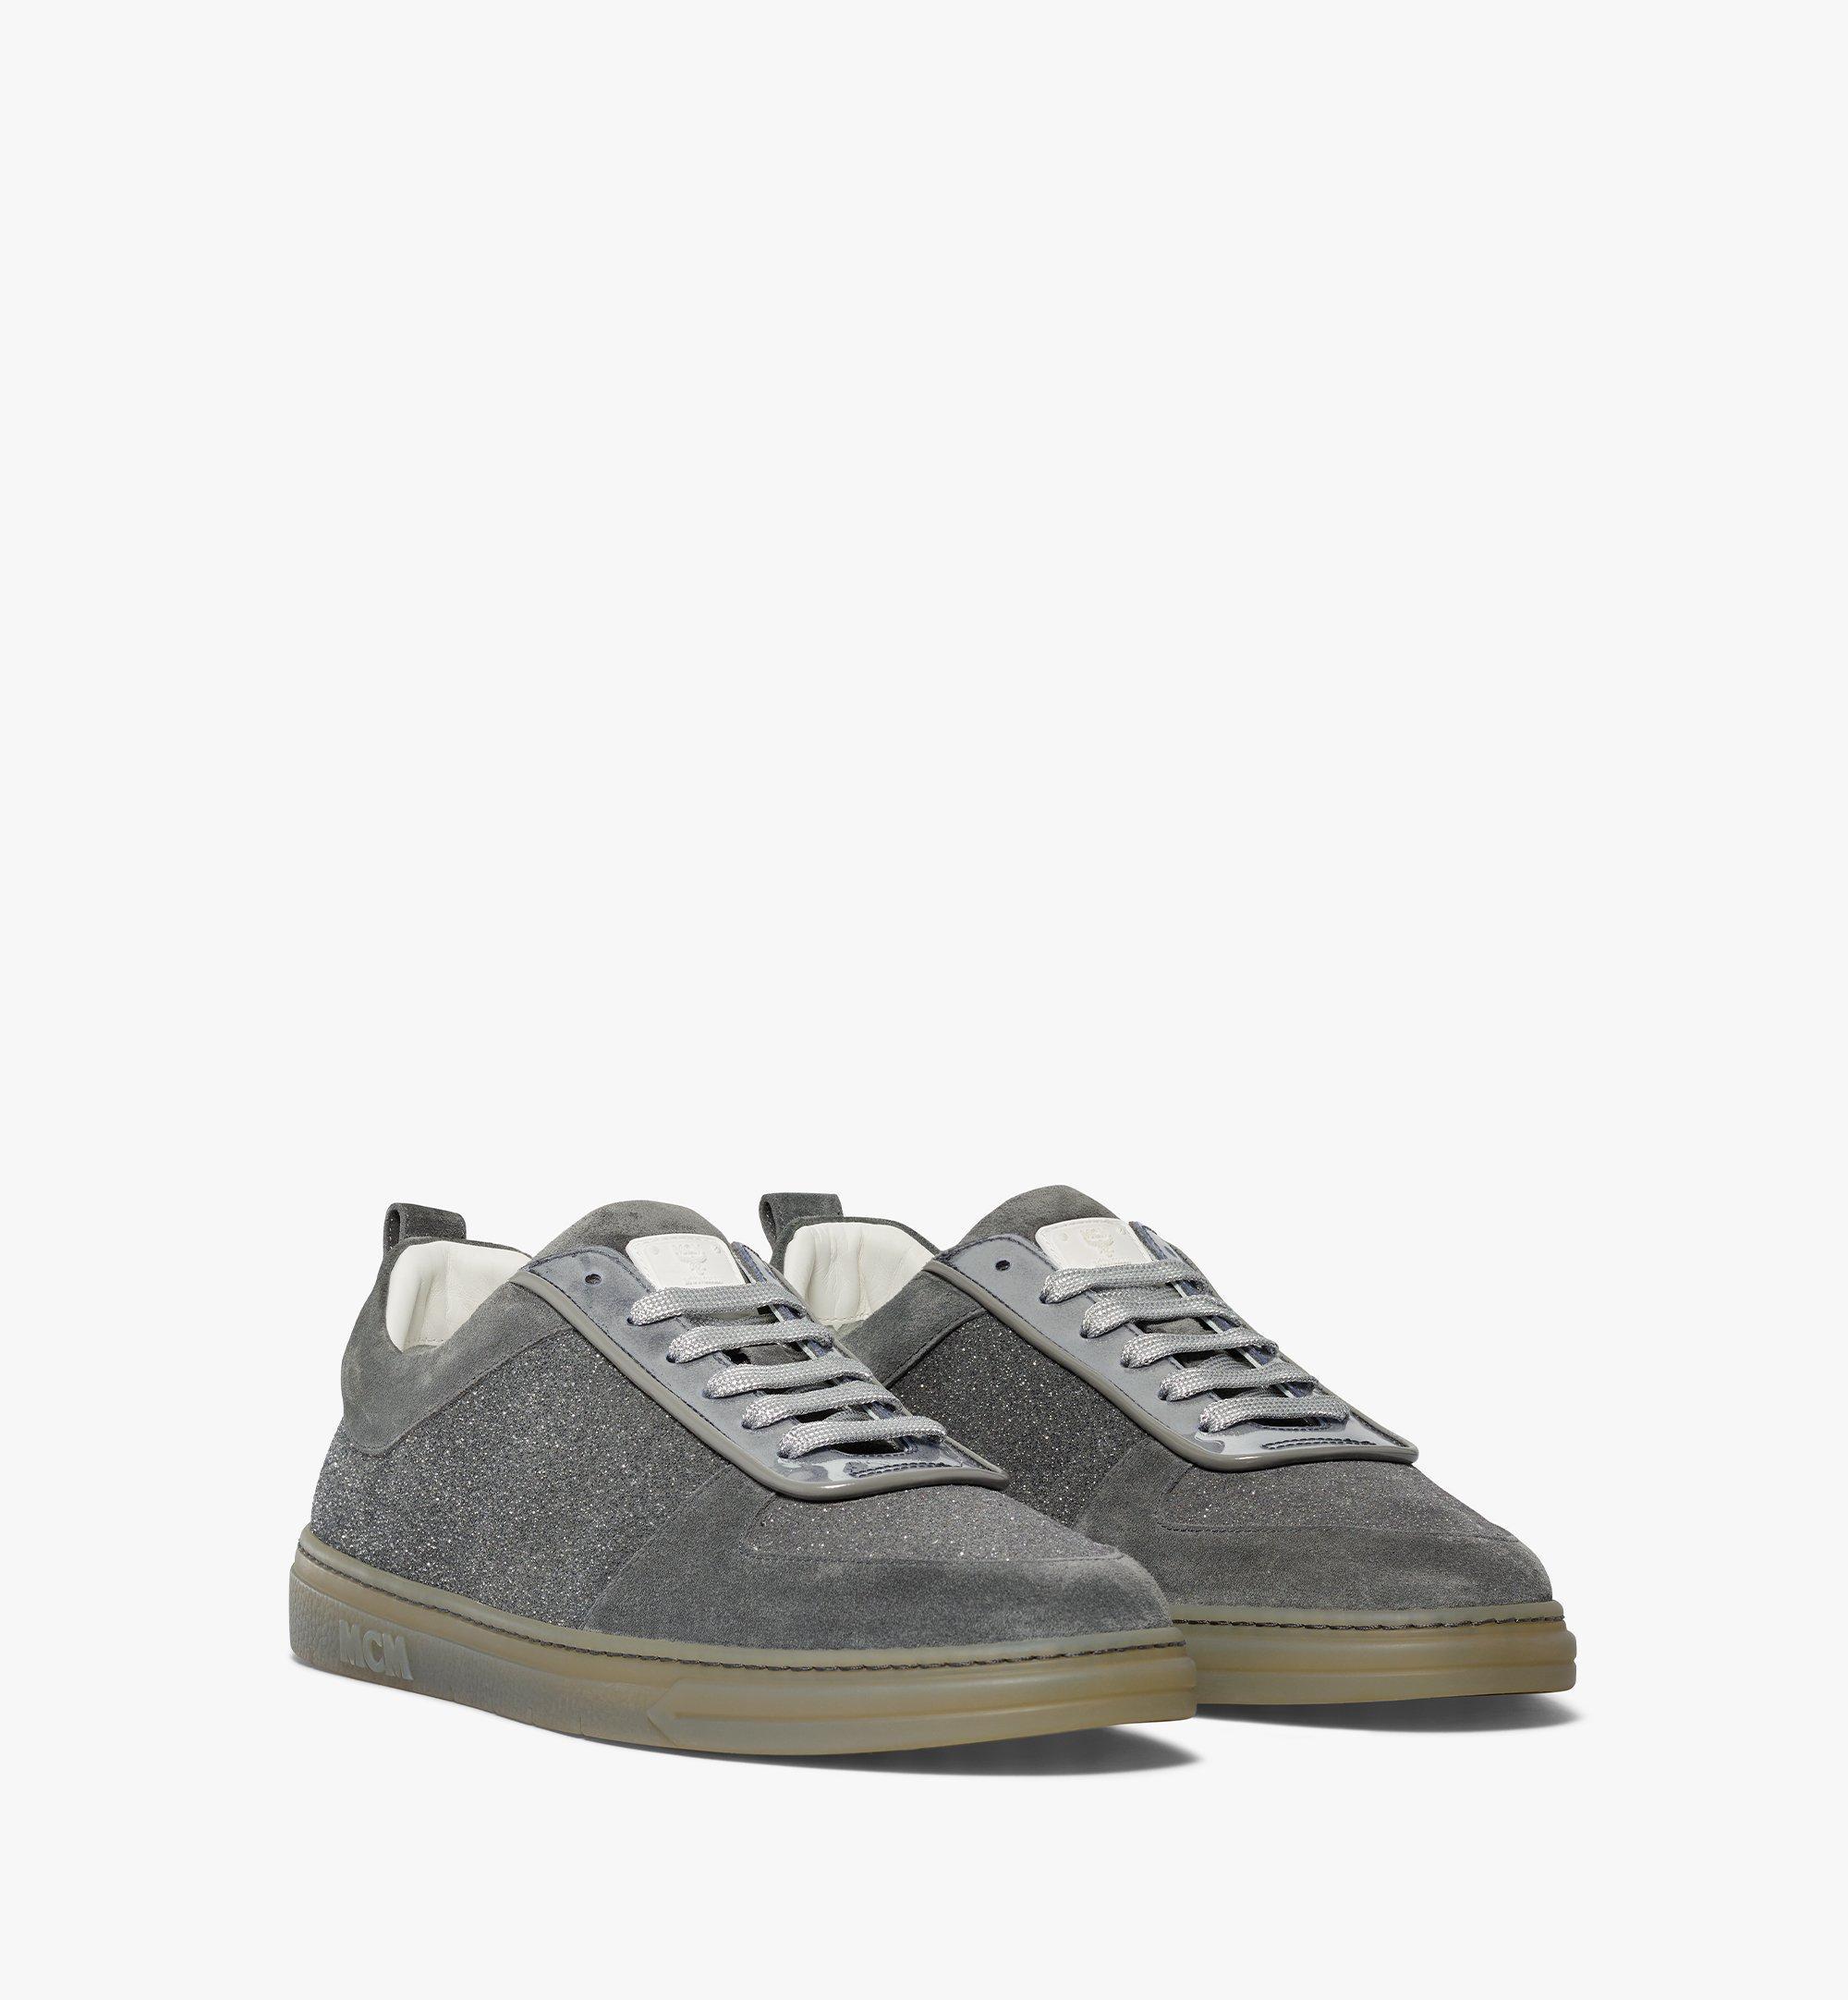 MCM Men's Terrain Lo Sneakers in Multi-Suede Leather Grey MEXBSMM06EO042 Alternate View 1